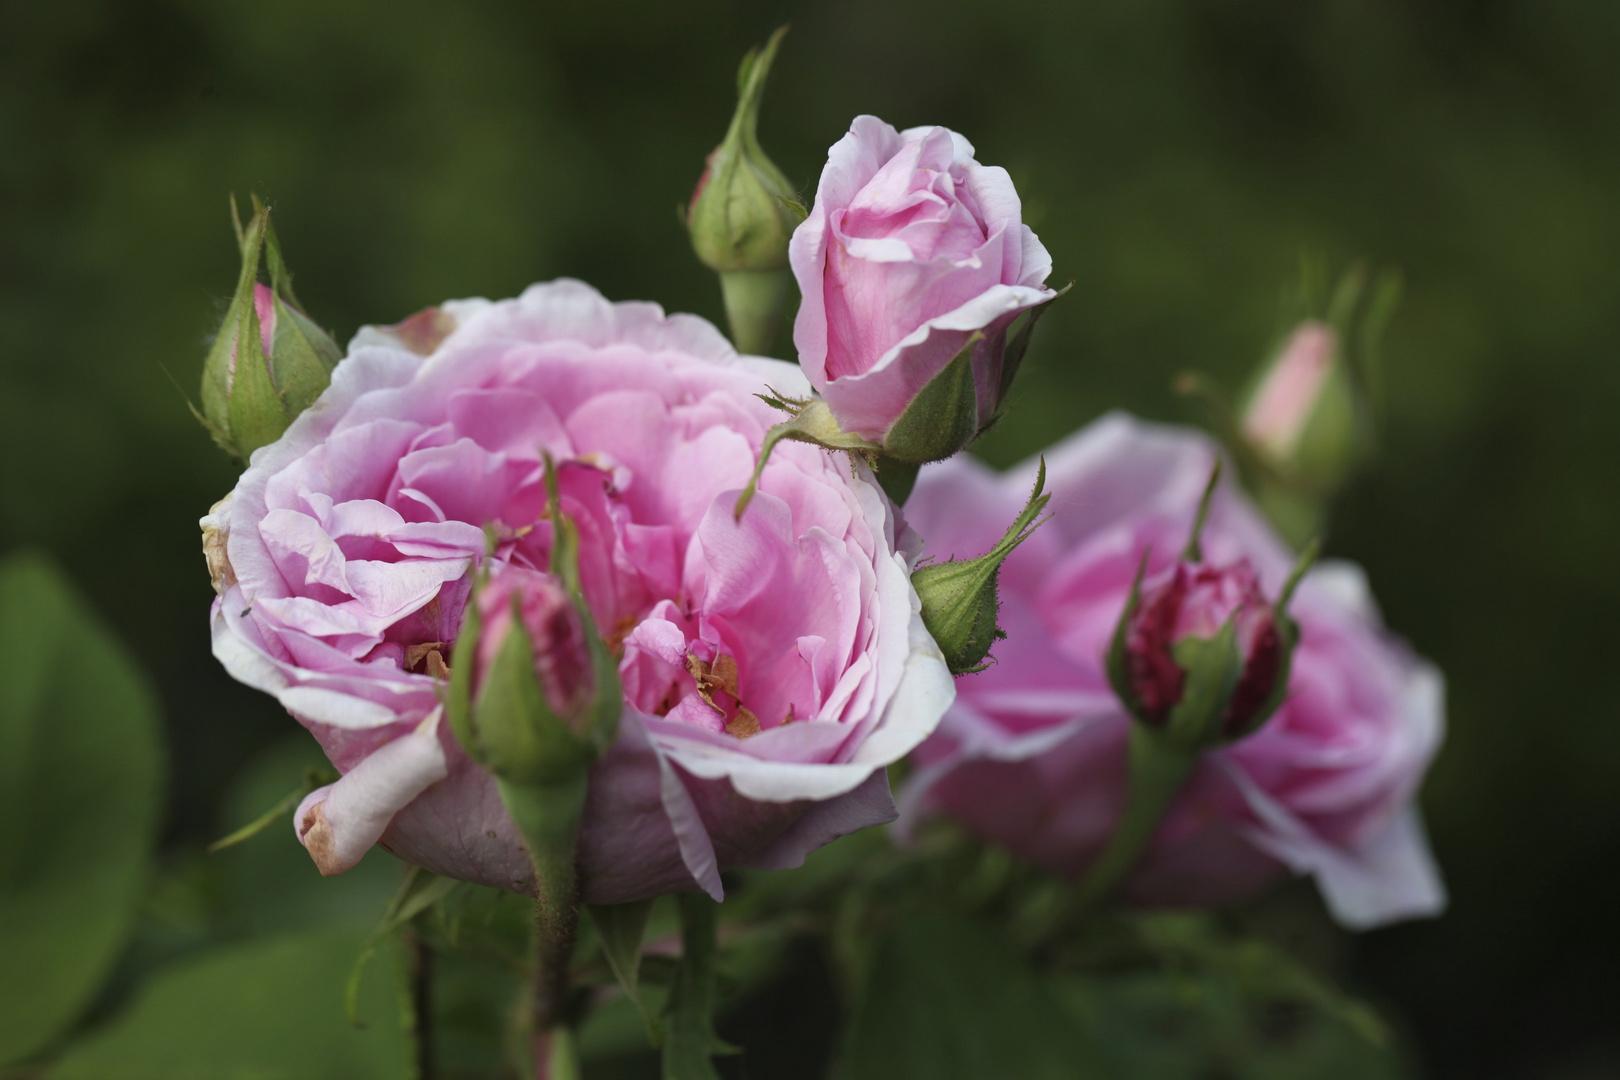 Rosen im Garten 2